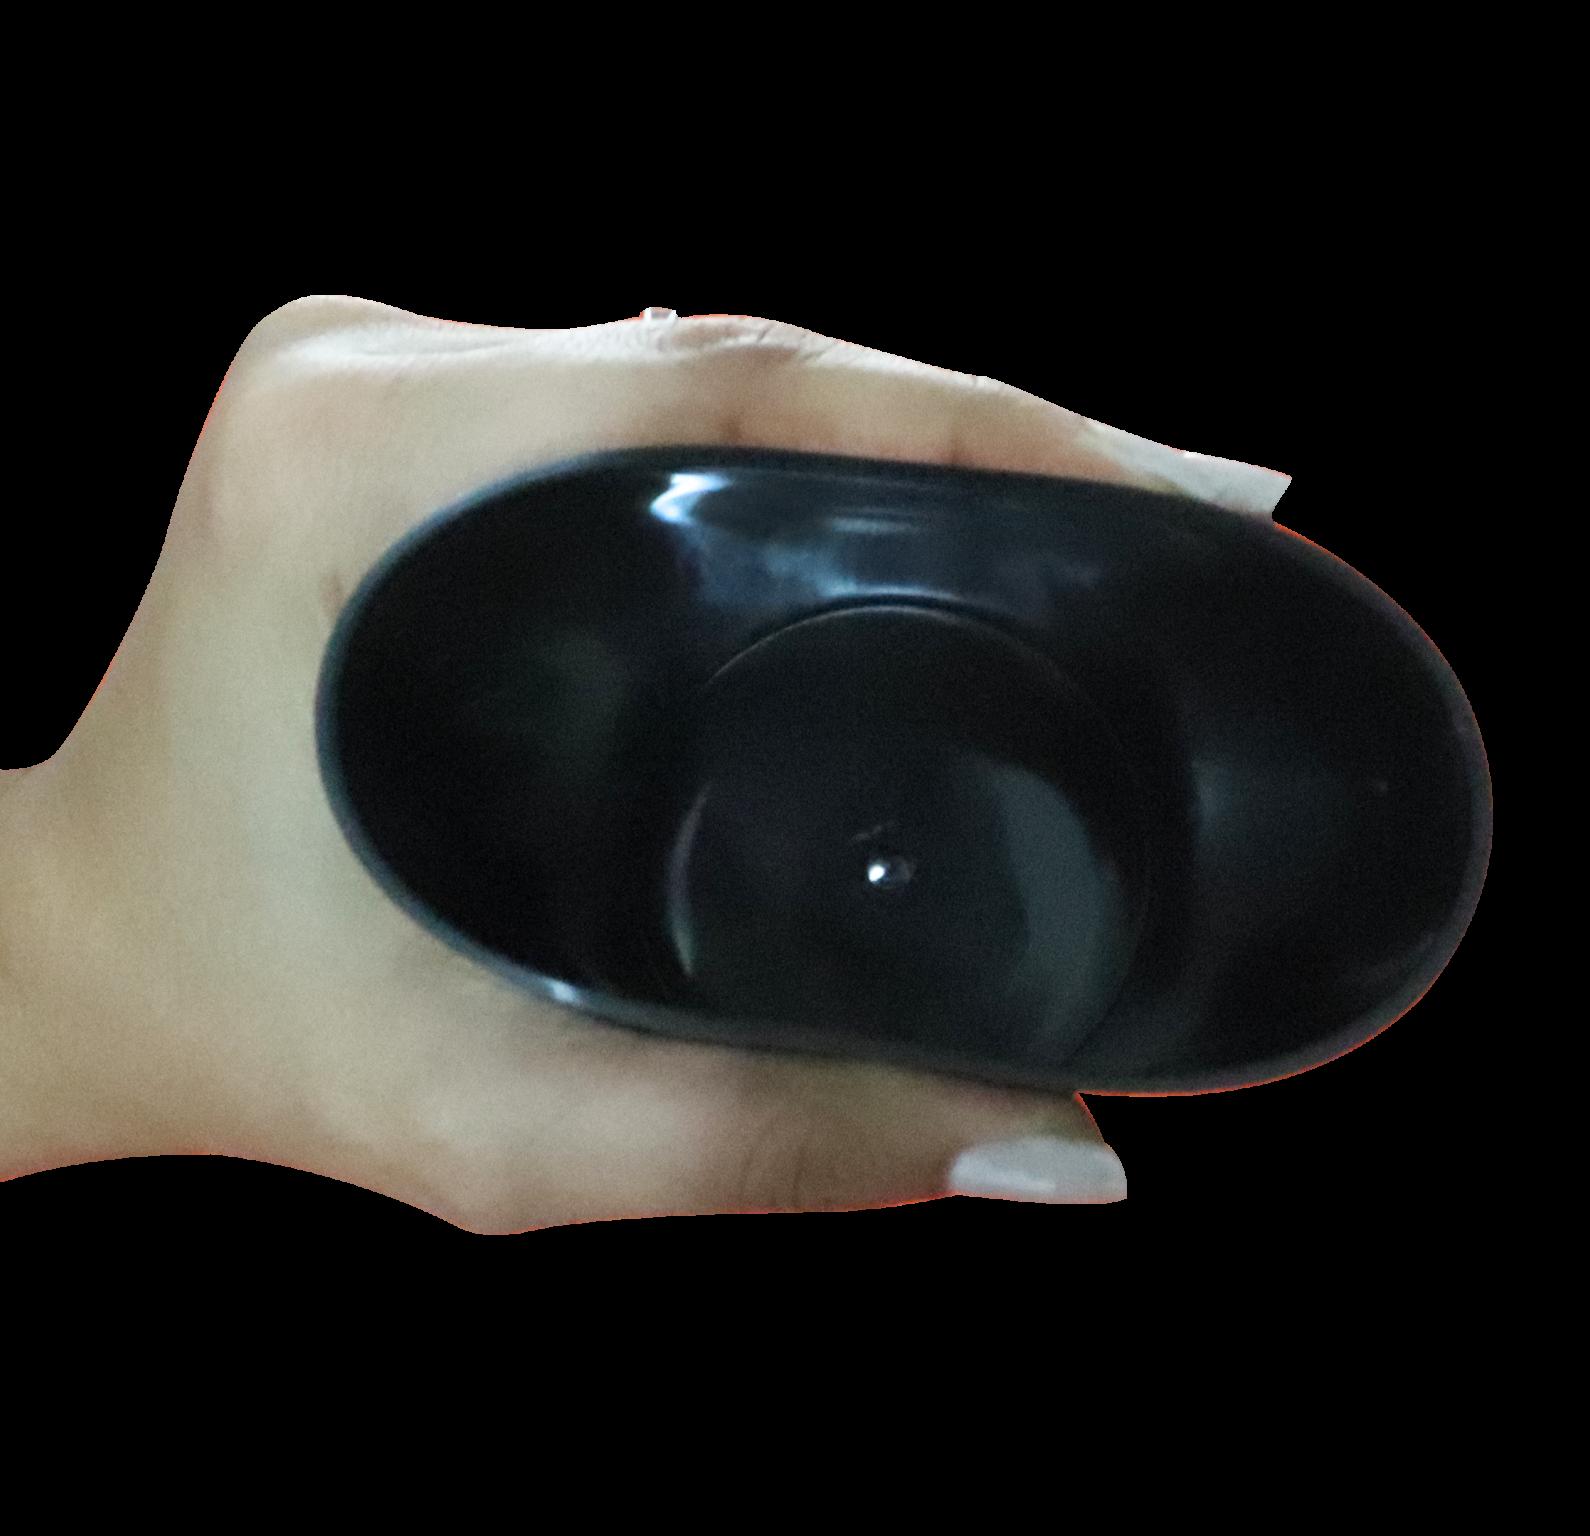 Copo Label 550ml - Rei da Selva - Flexibilidade do copo